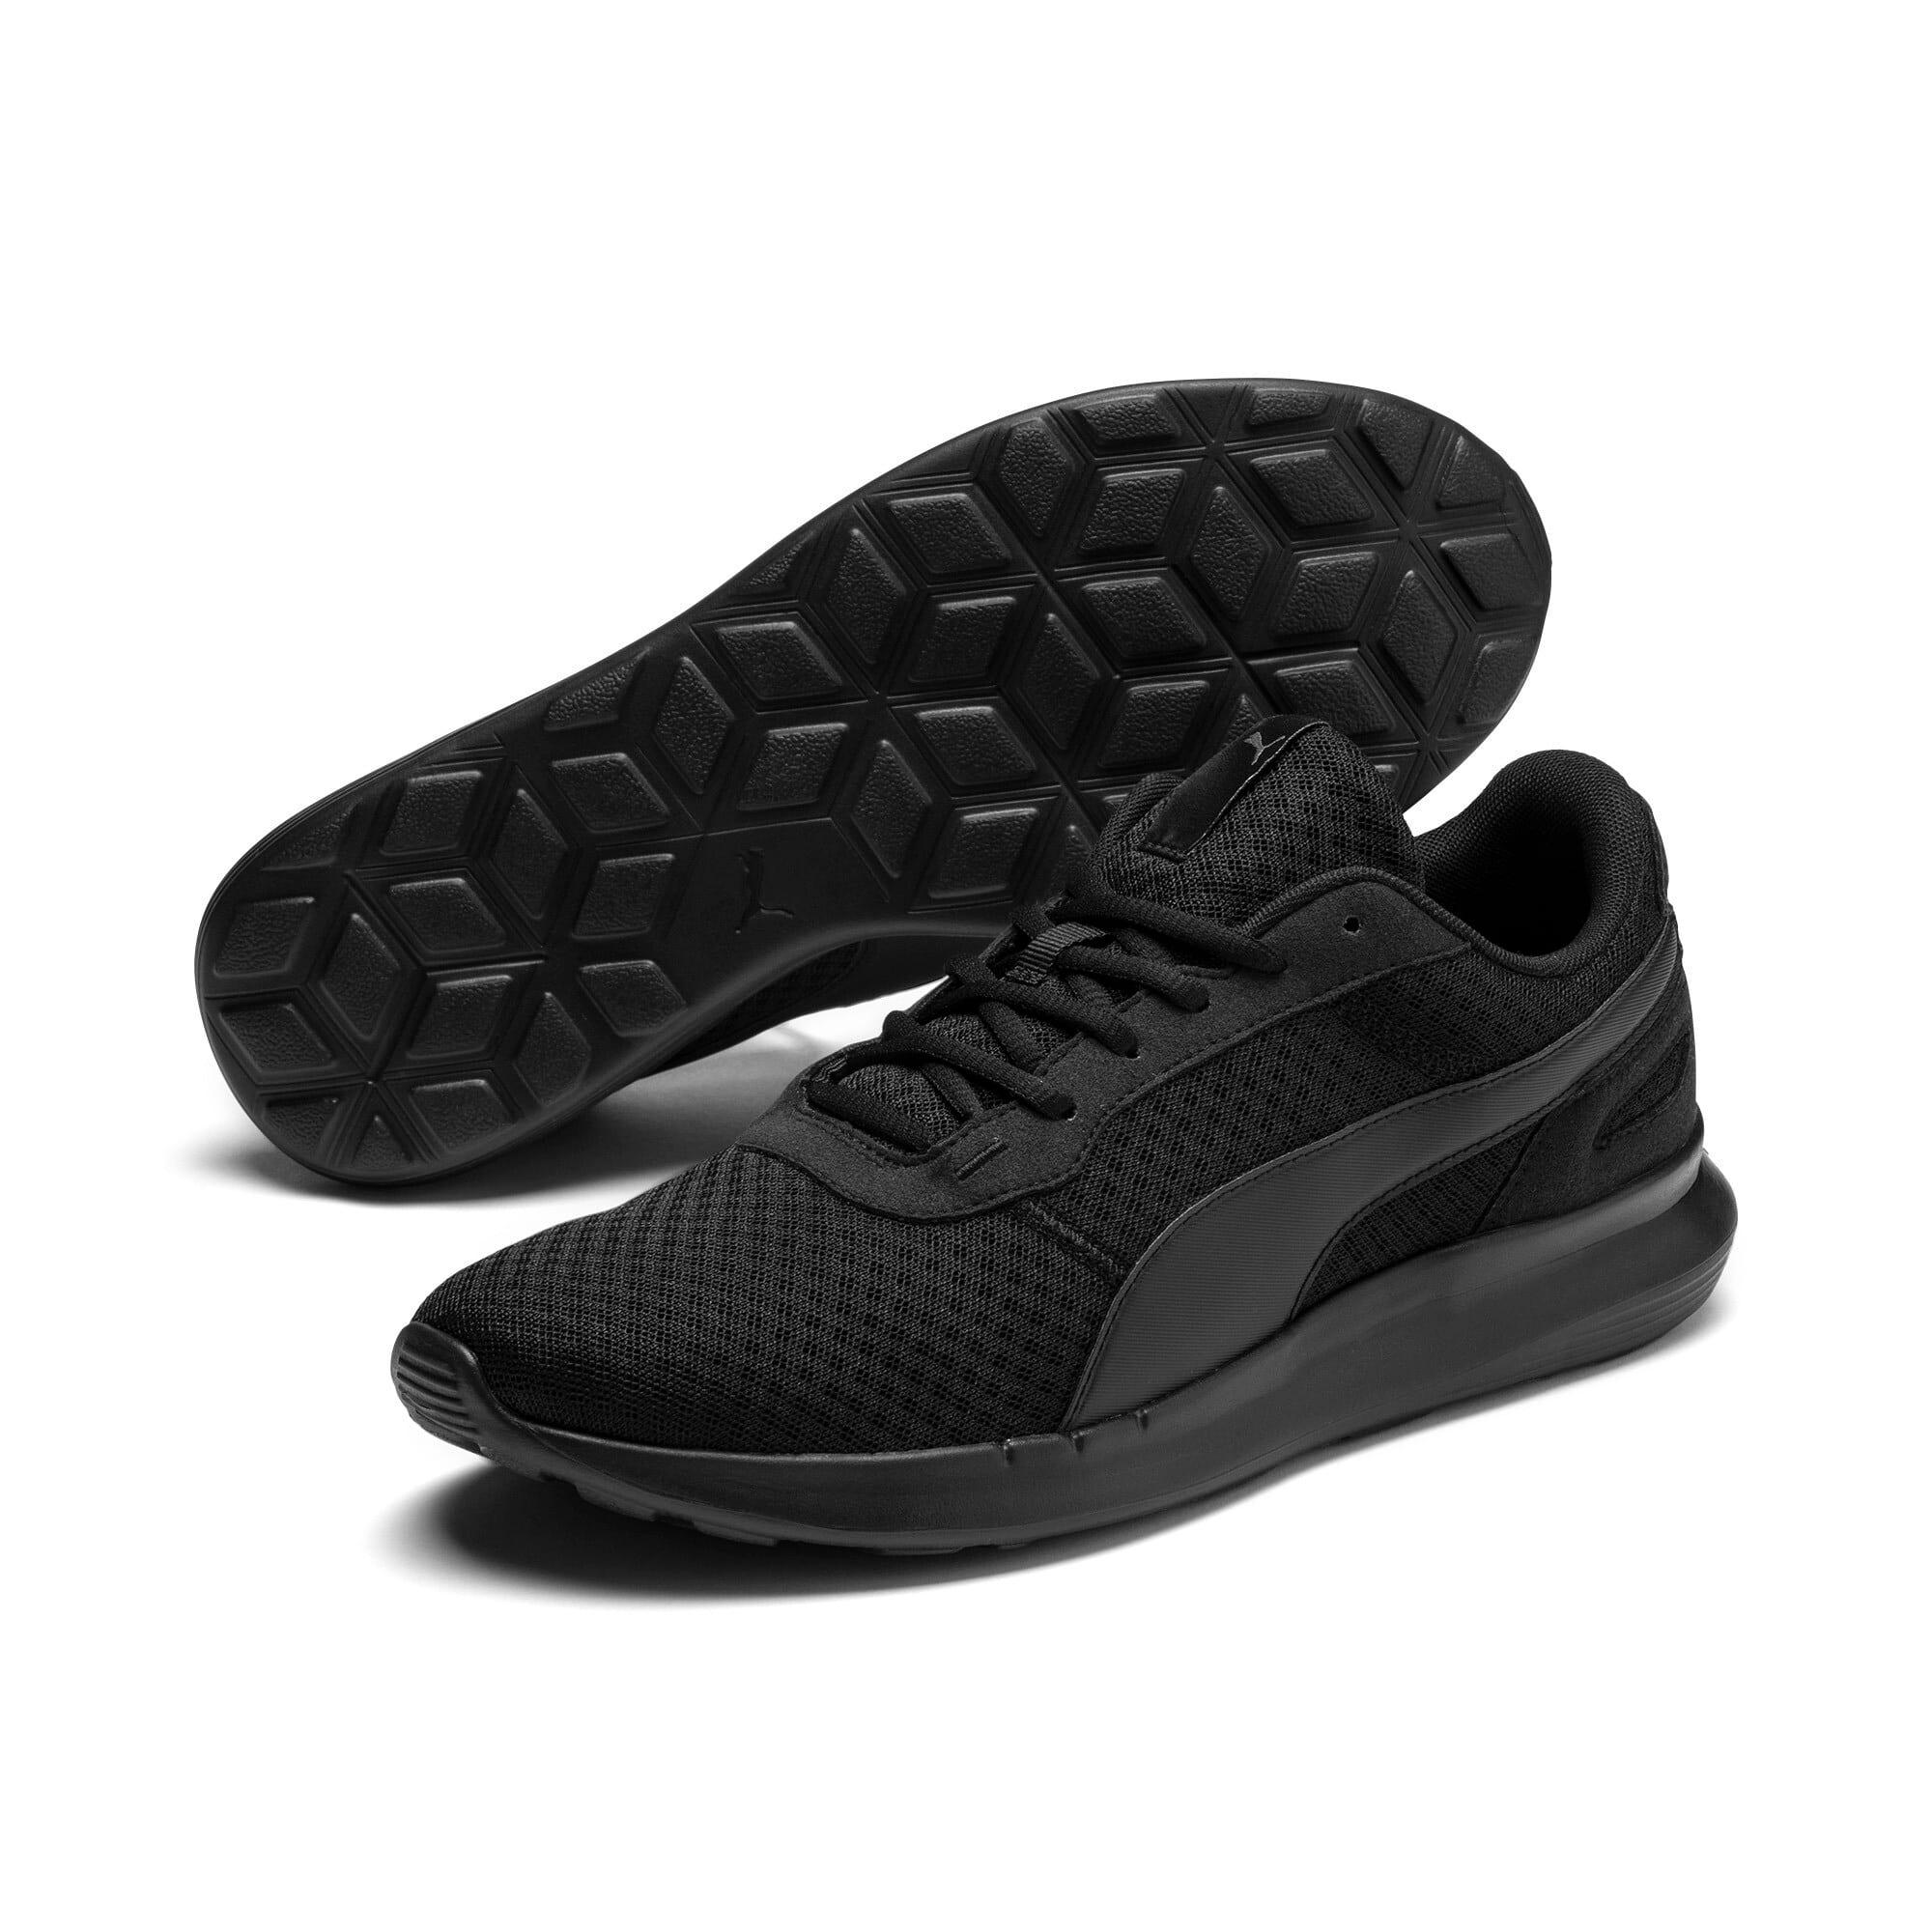 Thumbnail 2 of ST Activate Sneakers, Puma Black-Puma Black, medium